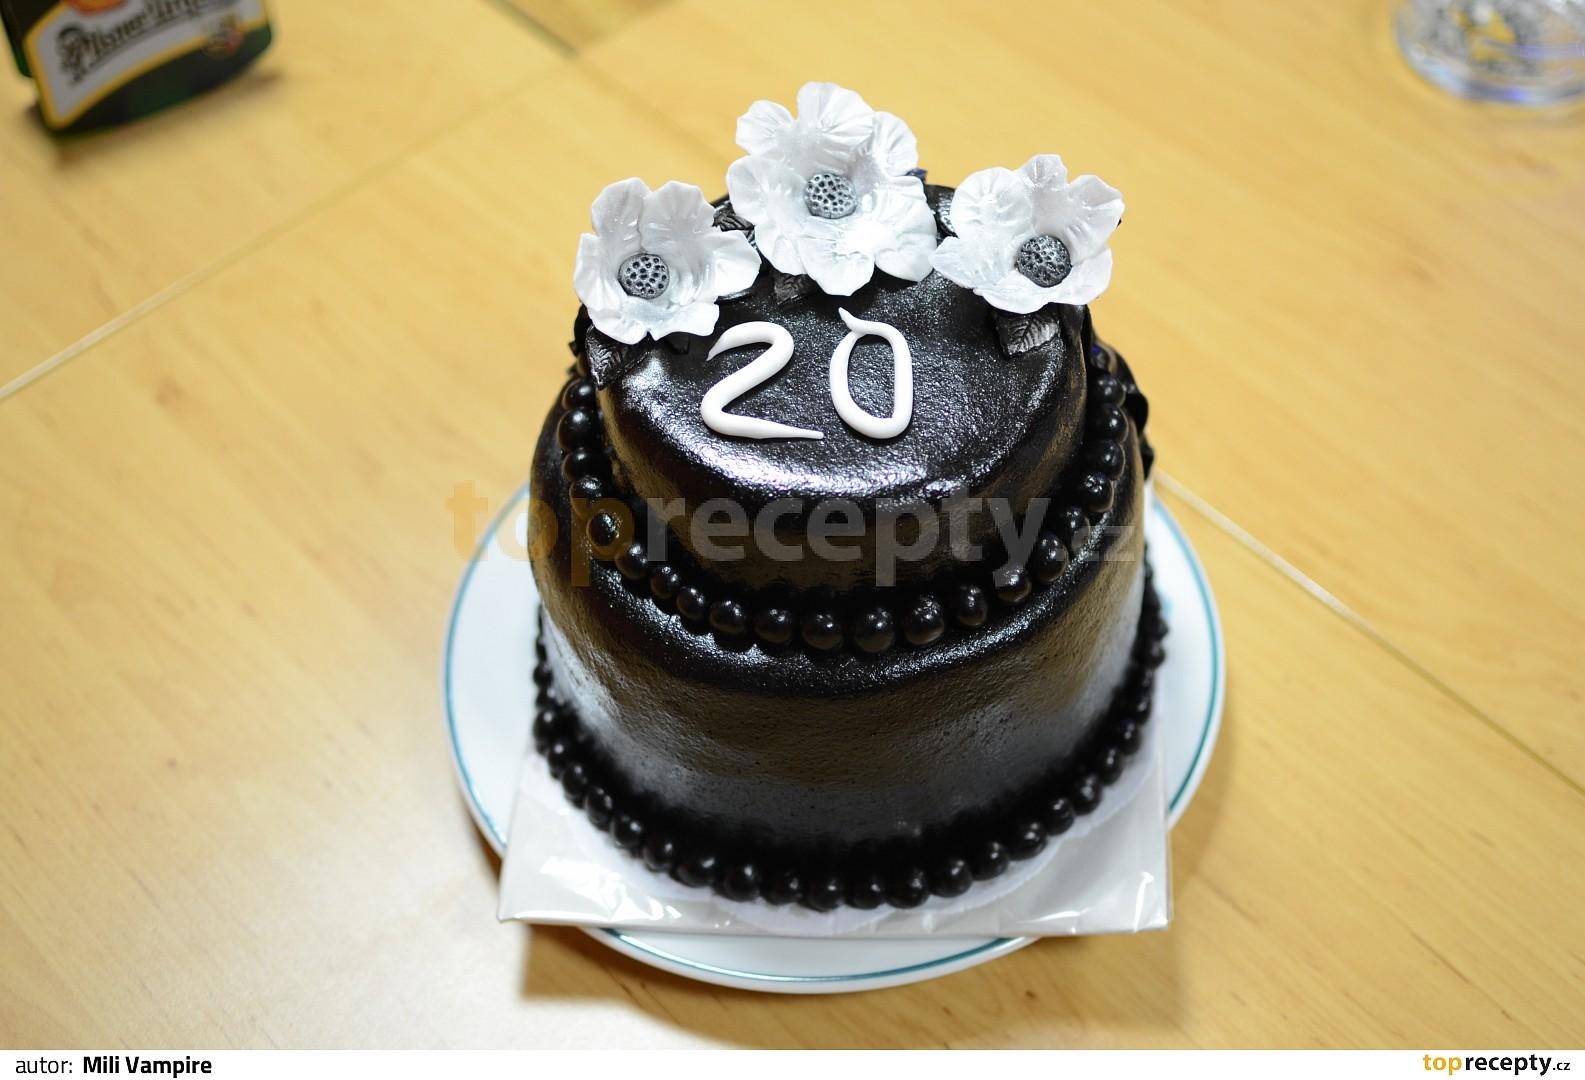 dort k 20 narozeninám Dort k 20. narozeninám recept   TopRecepty.cz dort k 20 narozeninám